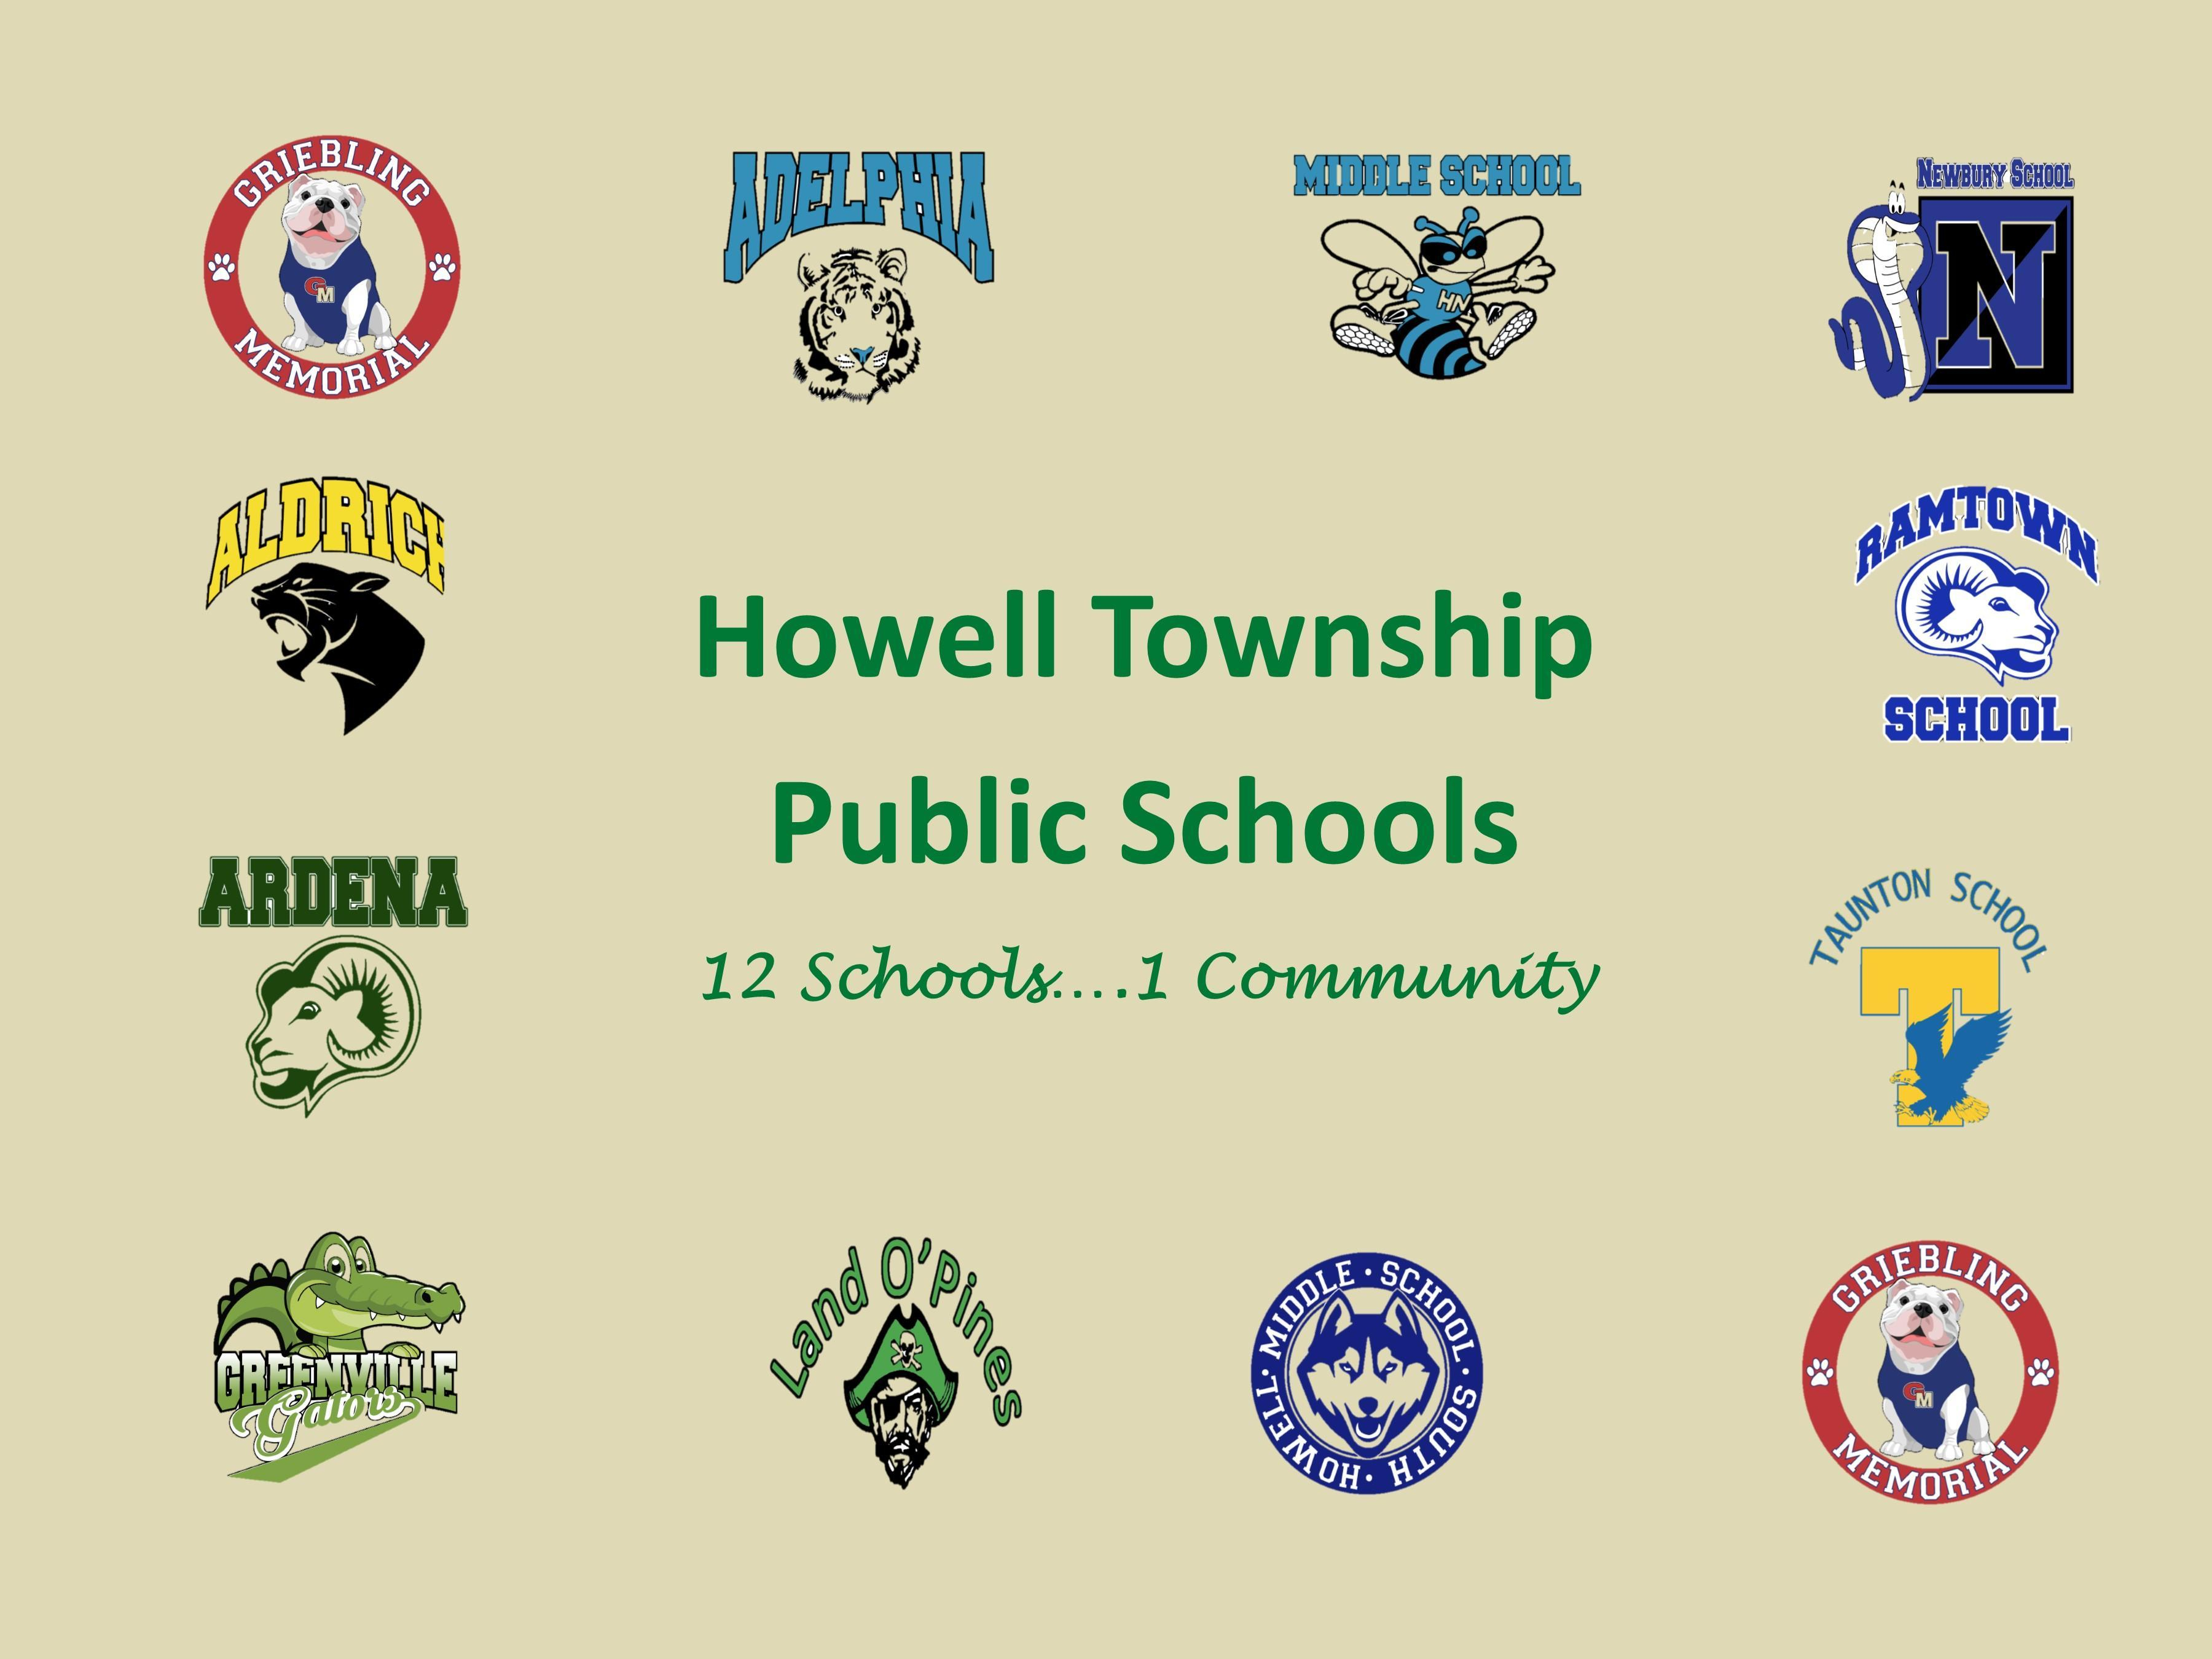 School Year Calendar – Our District – Howell Township Public For New Jersey School Public Educatiom Calendar